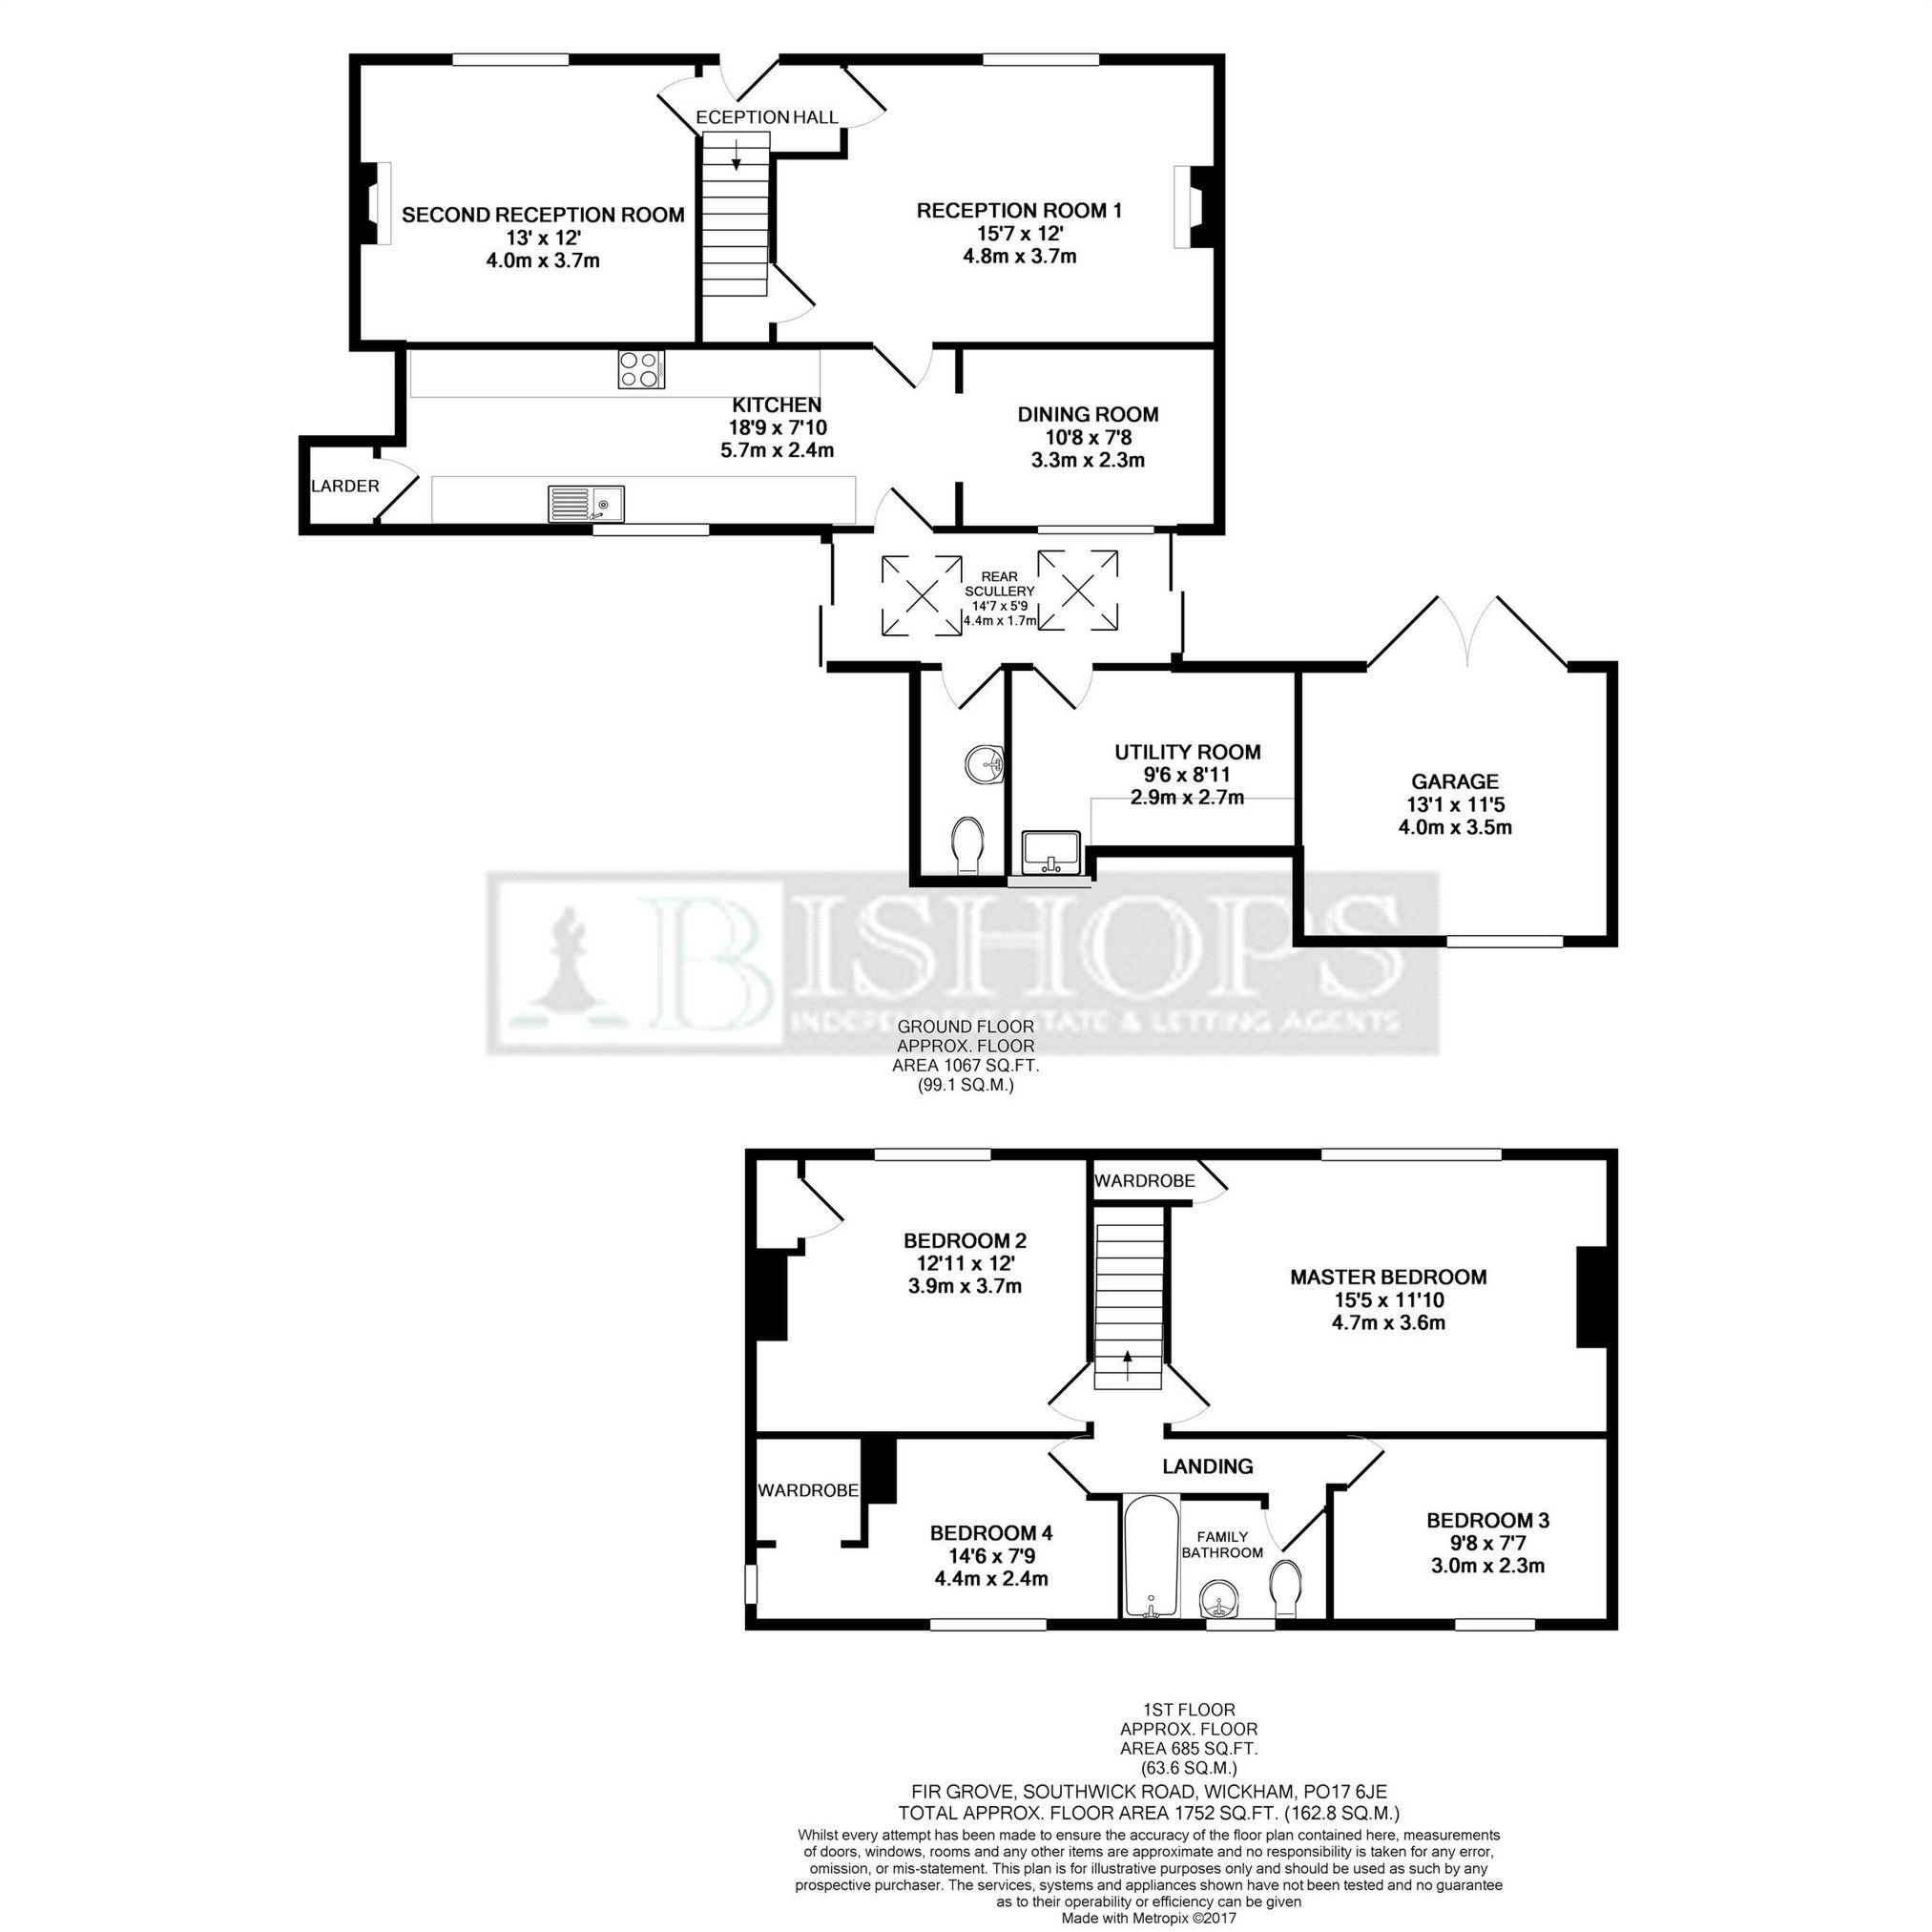 Southwick Road Wickham Po17 4 Bedroom Detached House For